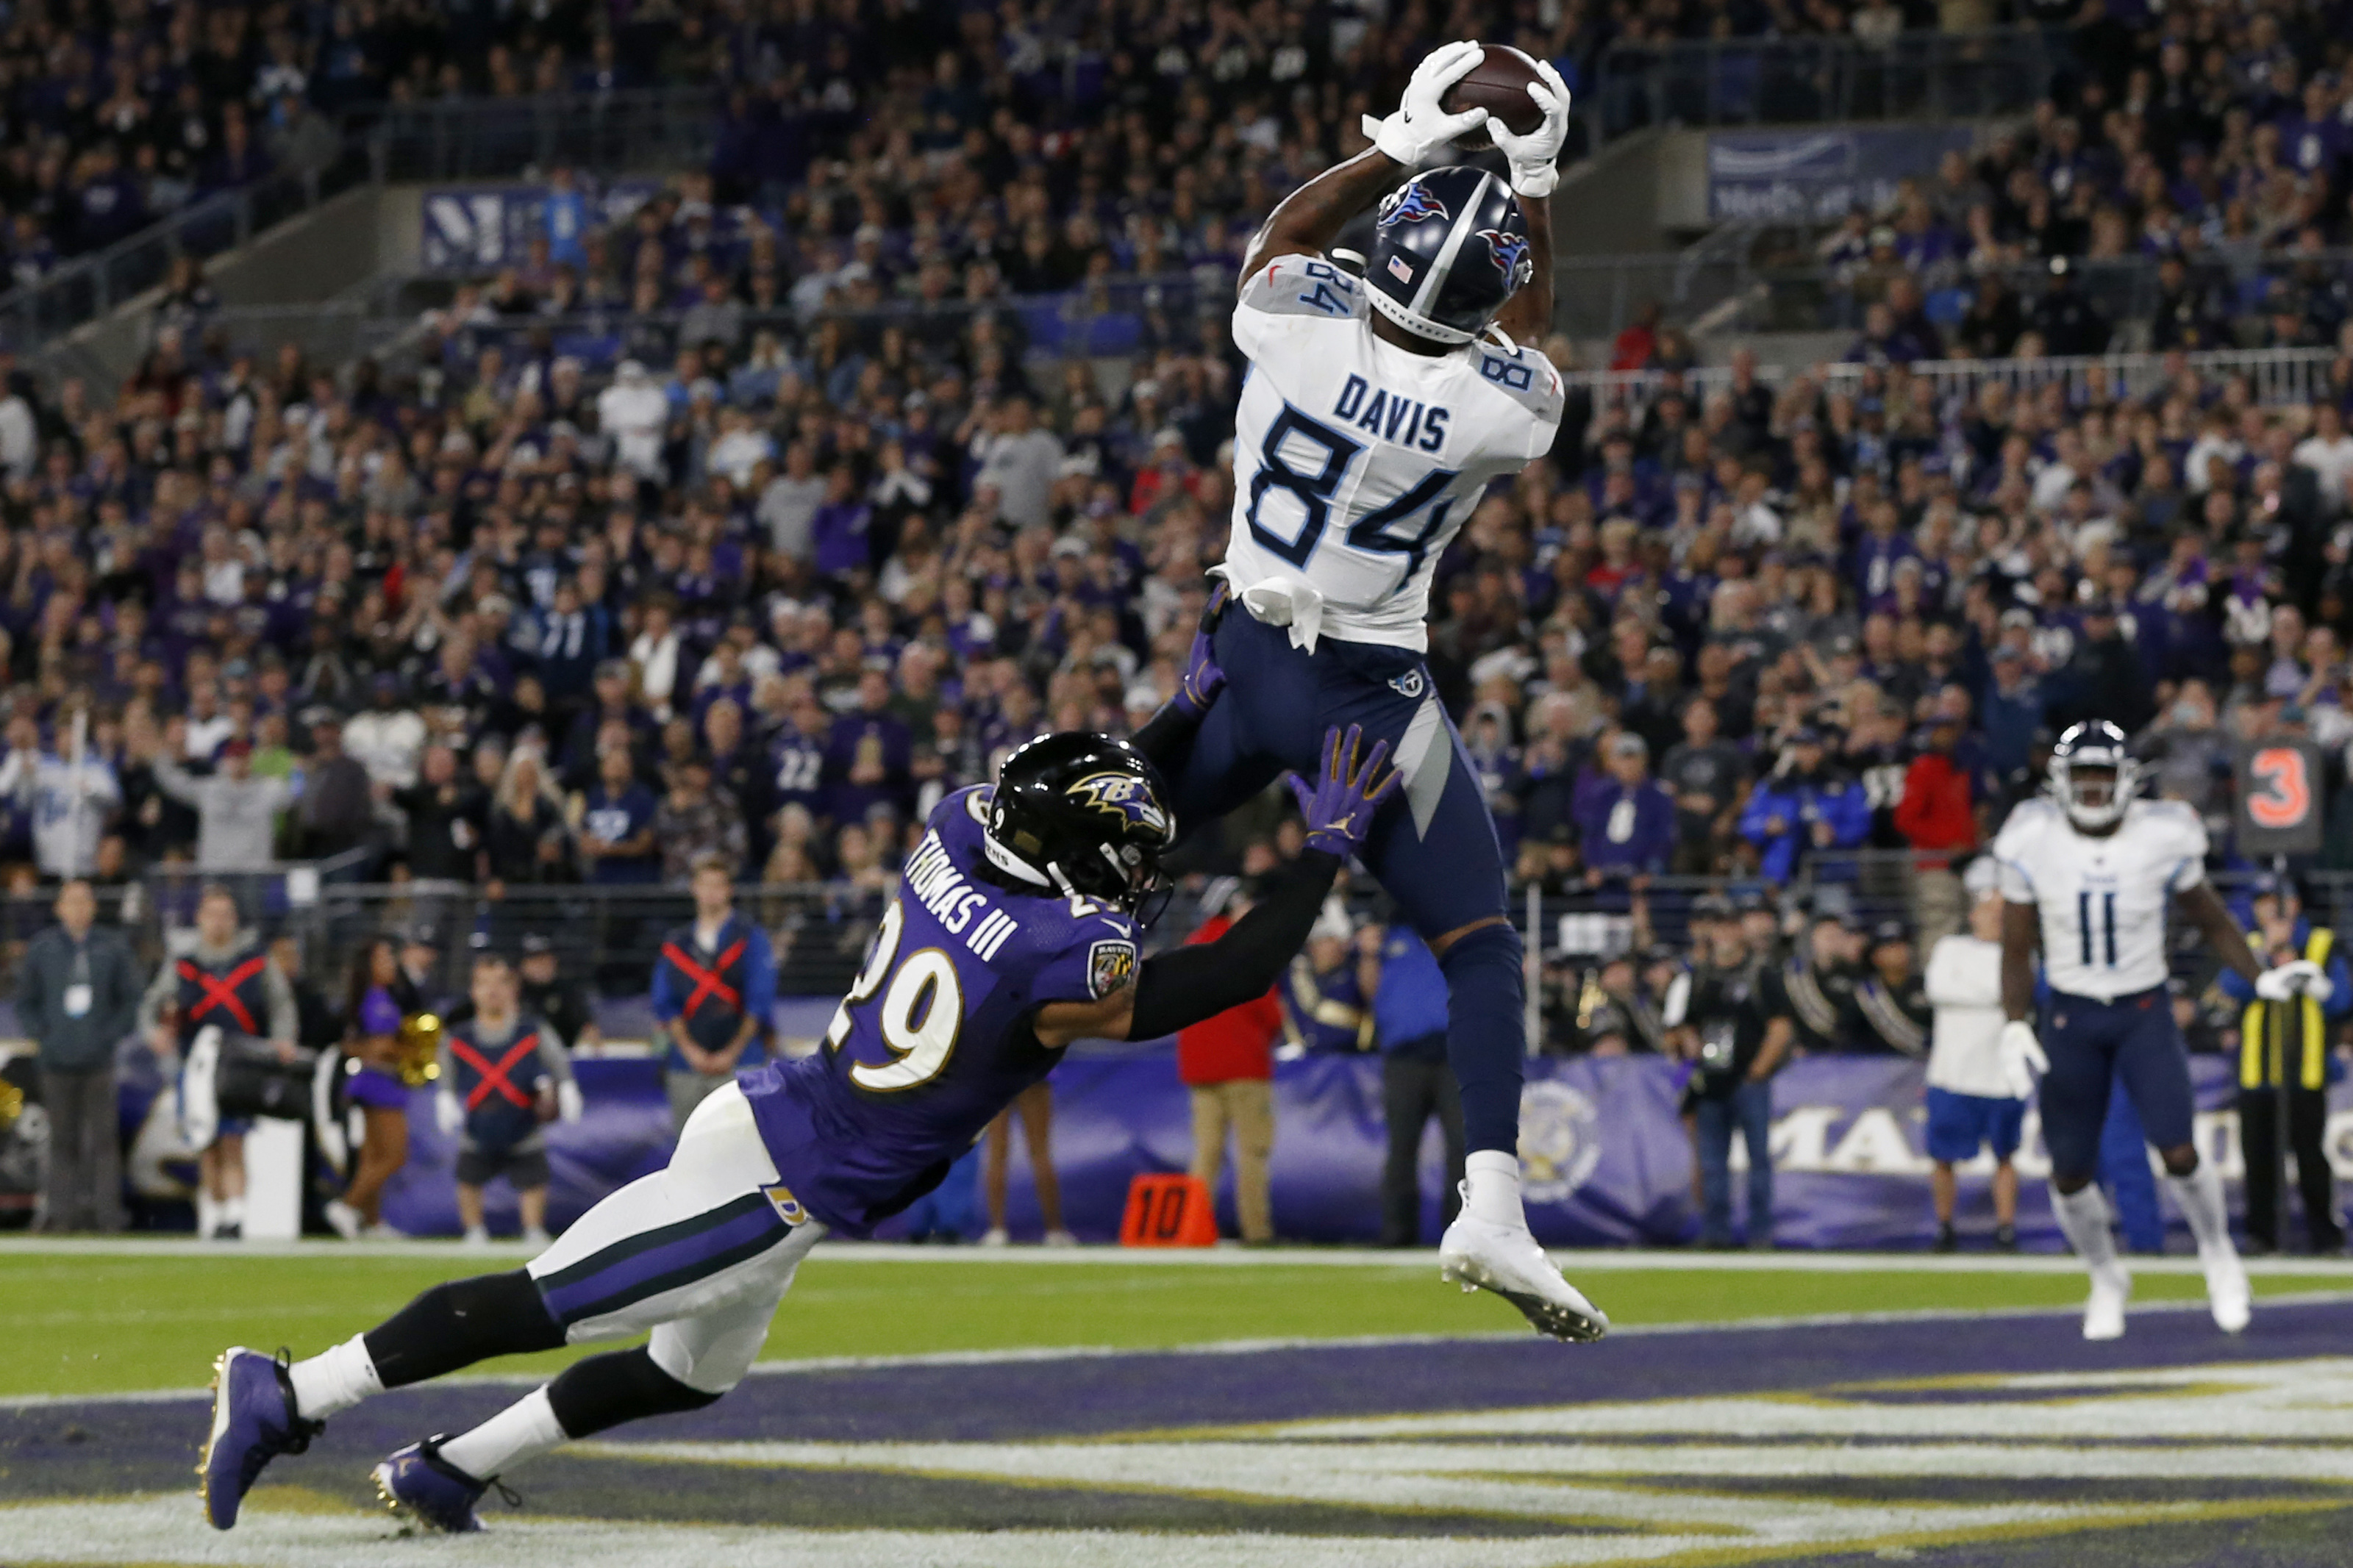 Detroit Lions: Trading for Corey Davis good for both organizations